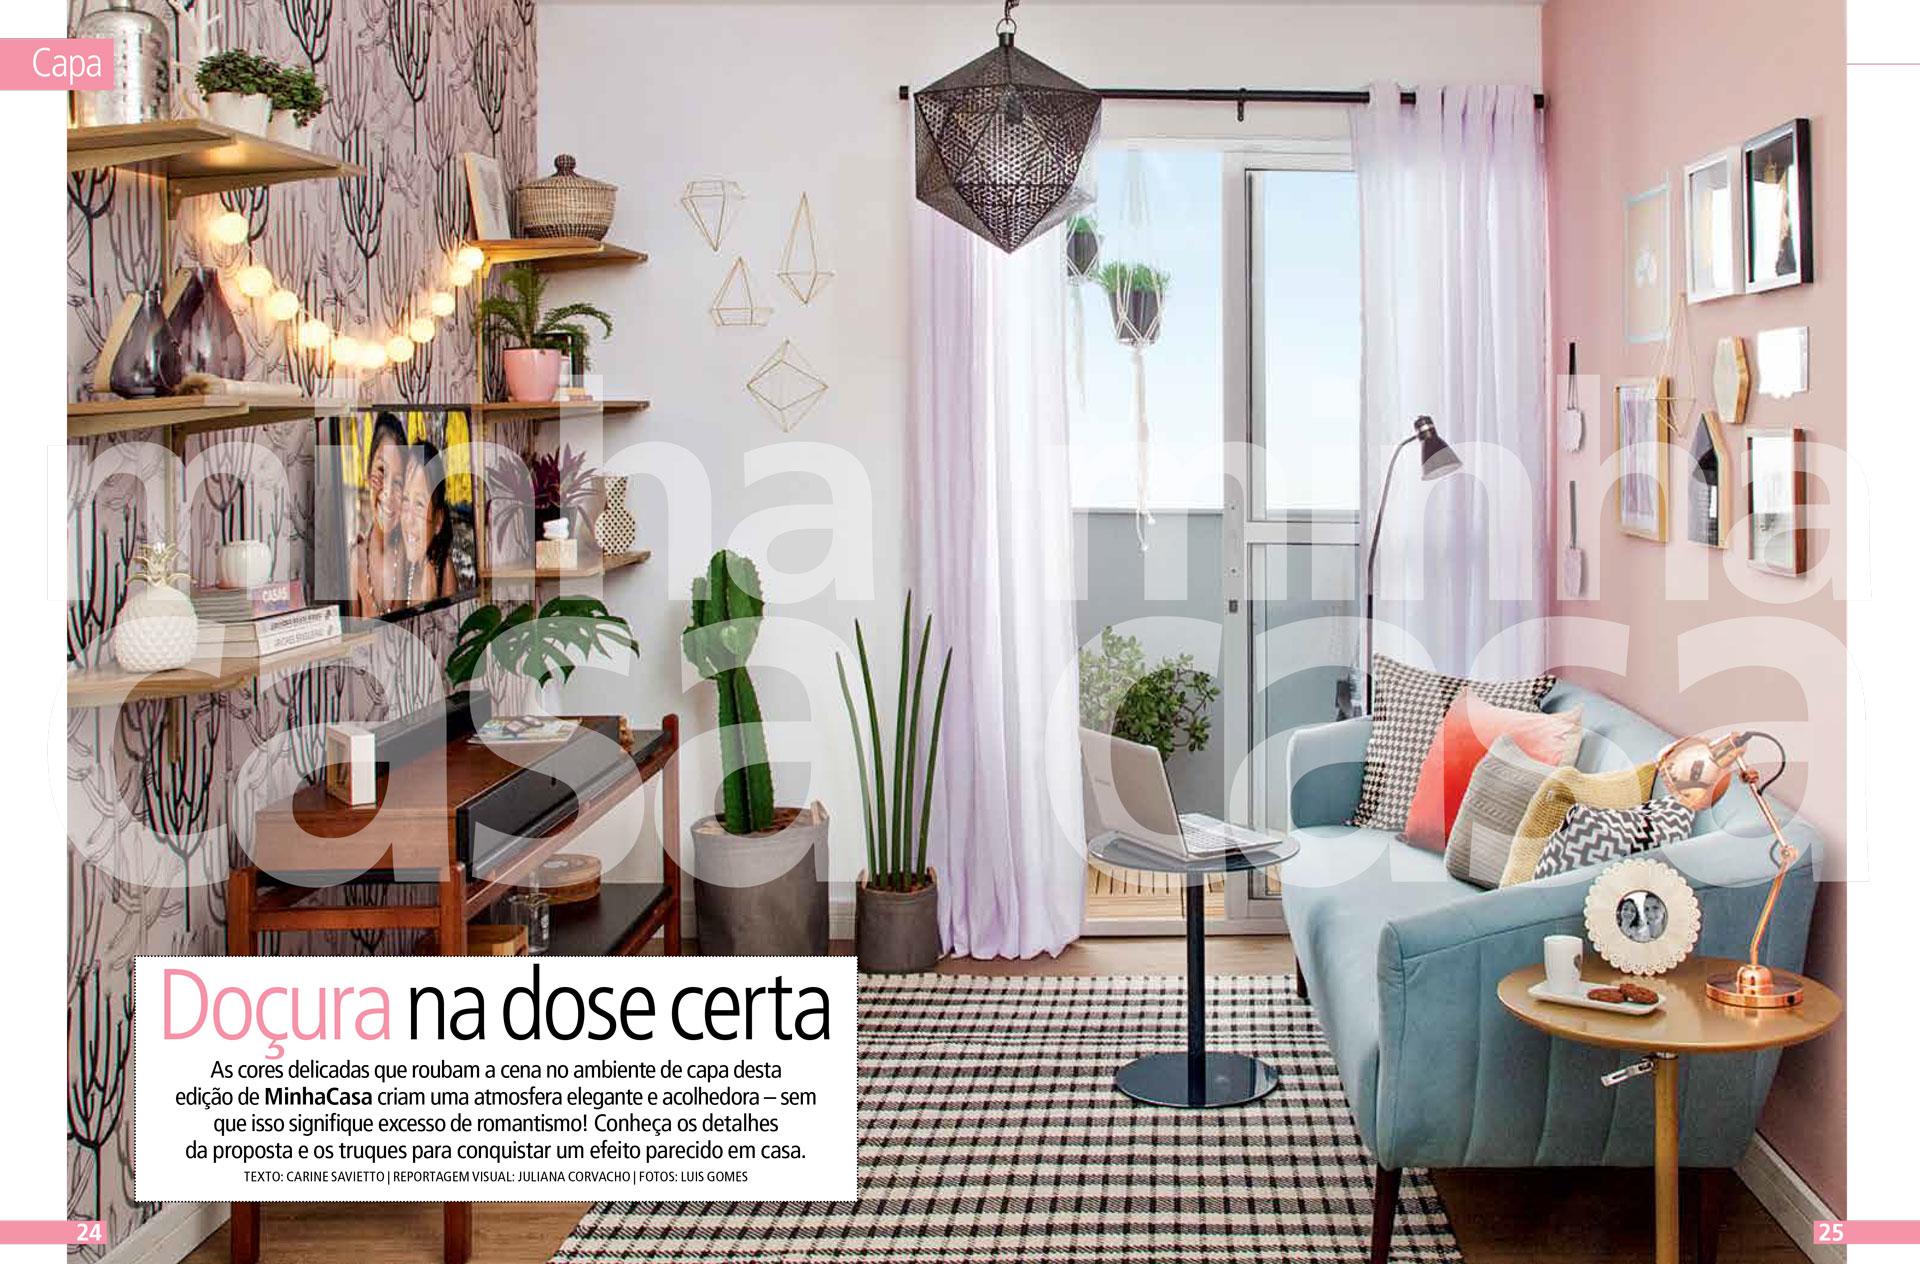 minha-casa-mar-2016-d2n-arquitetura-2